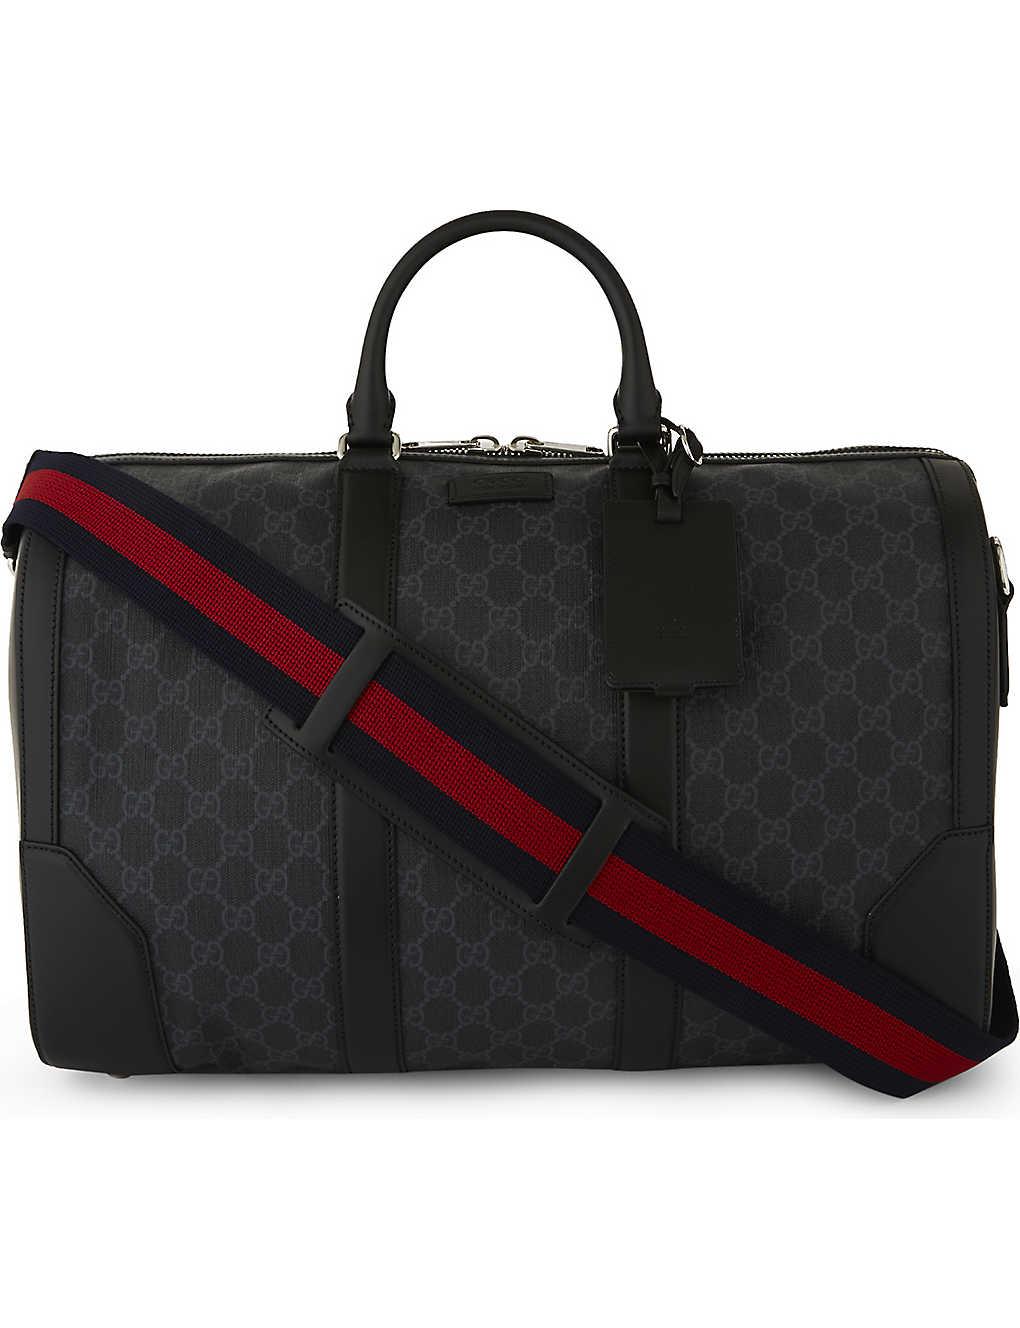 3065671cd GUCCI - Supreme canvas and leather duffle bag | Selfridges.com